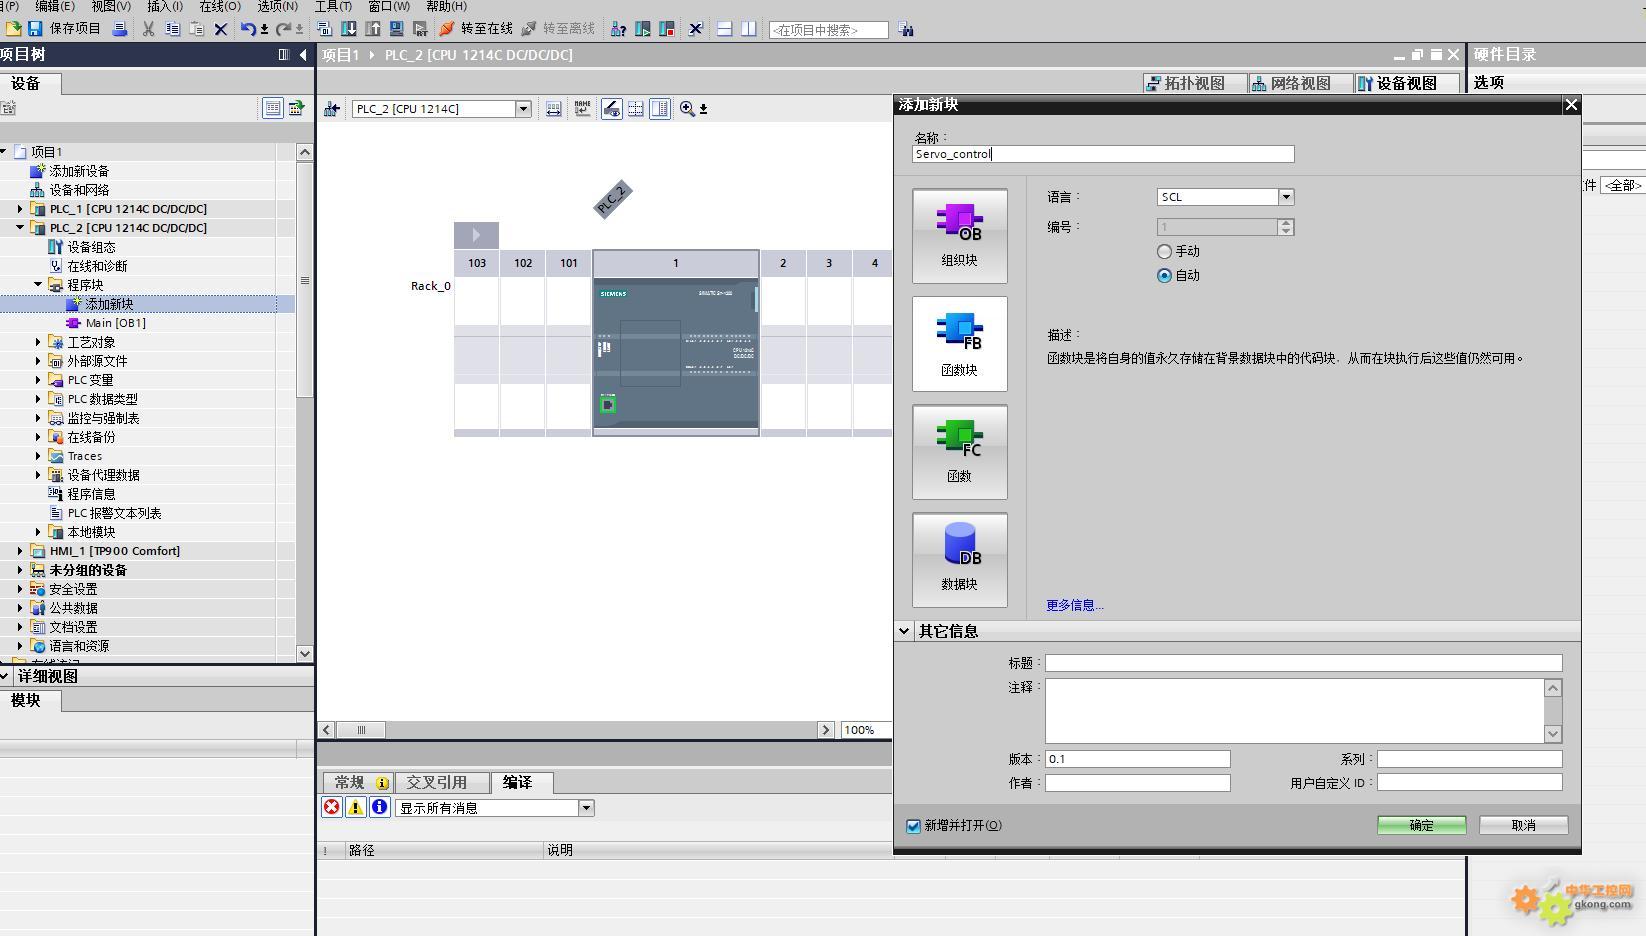 S7-1200 FB脉冲控制各品牌伺服